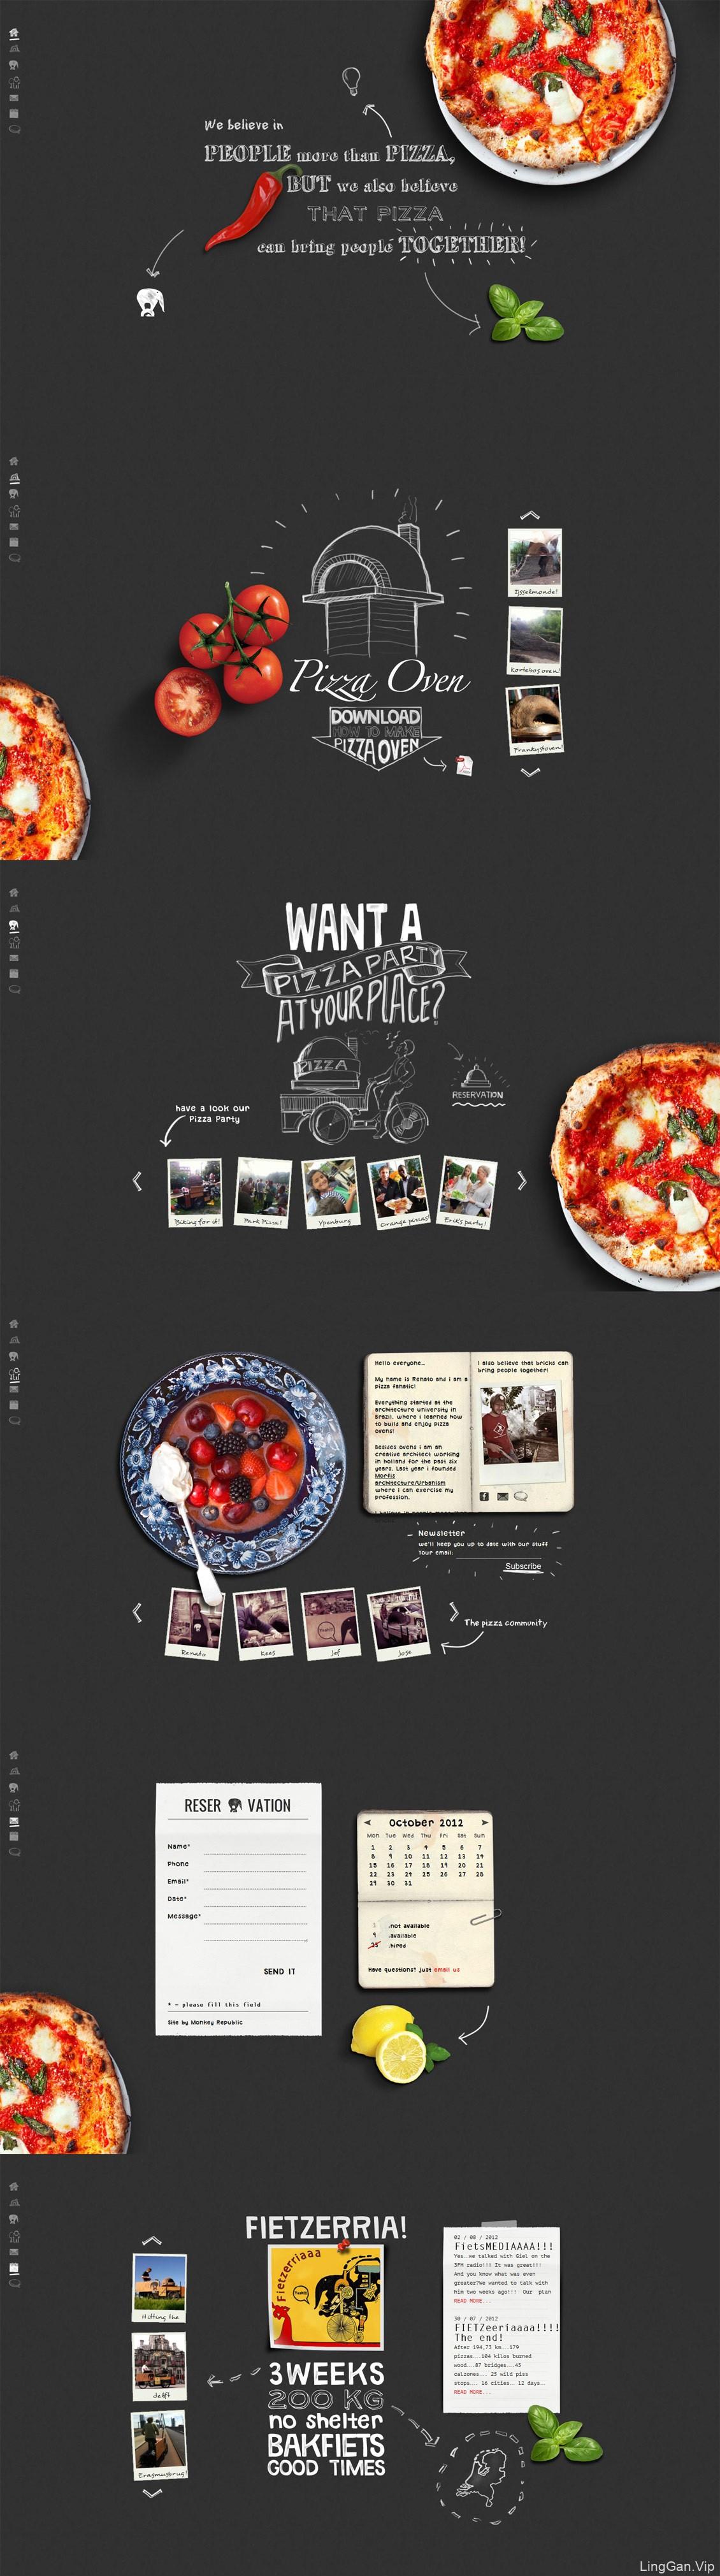 pizza网站设计-美食网站